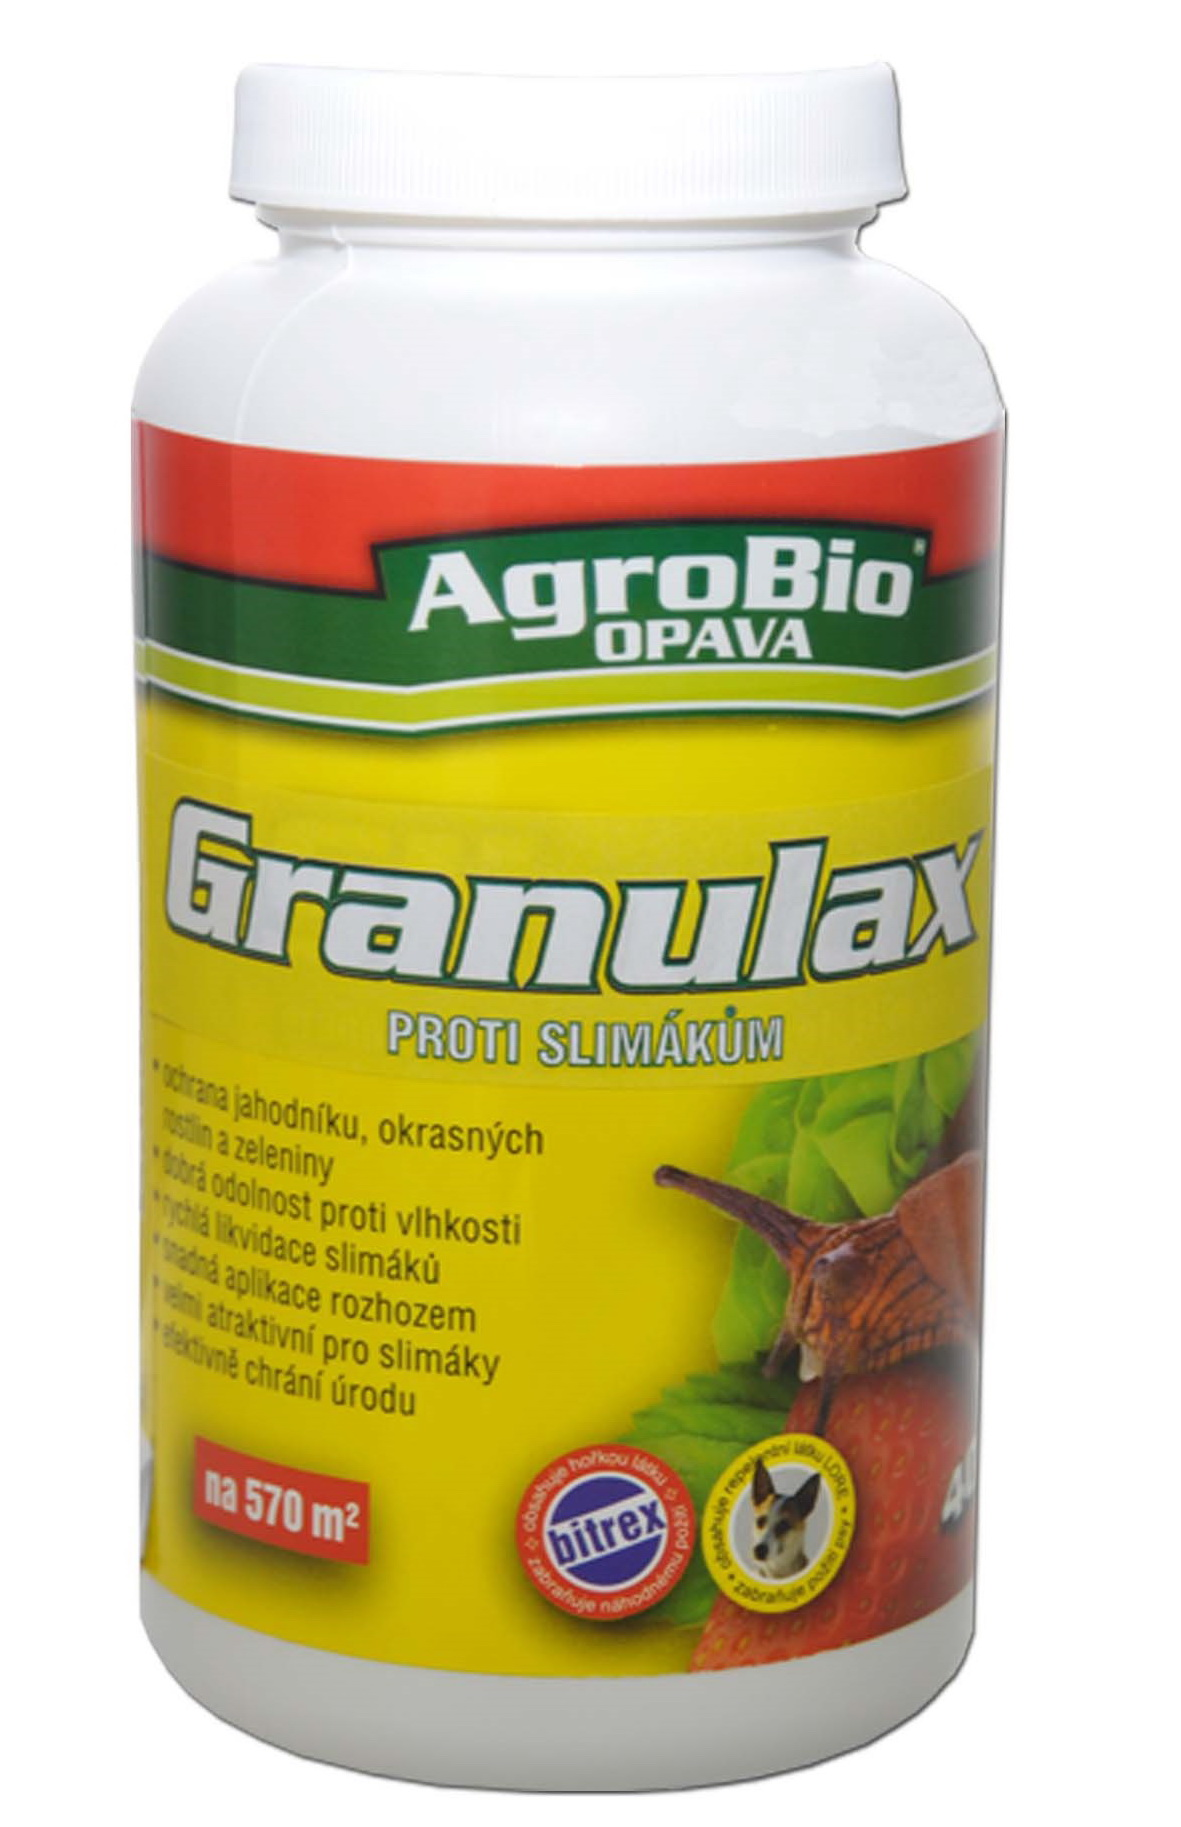 Granulax 400g (dříve Slimax)